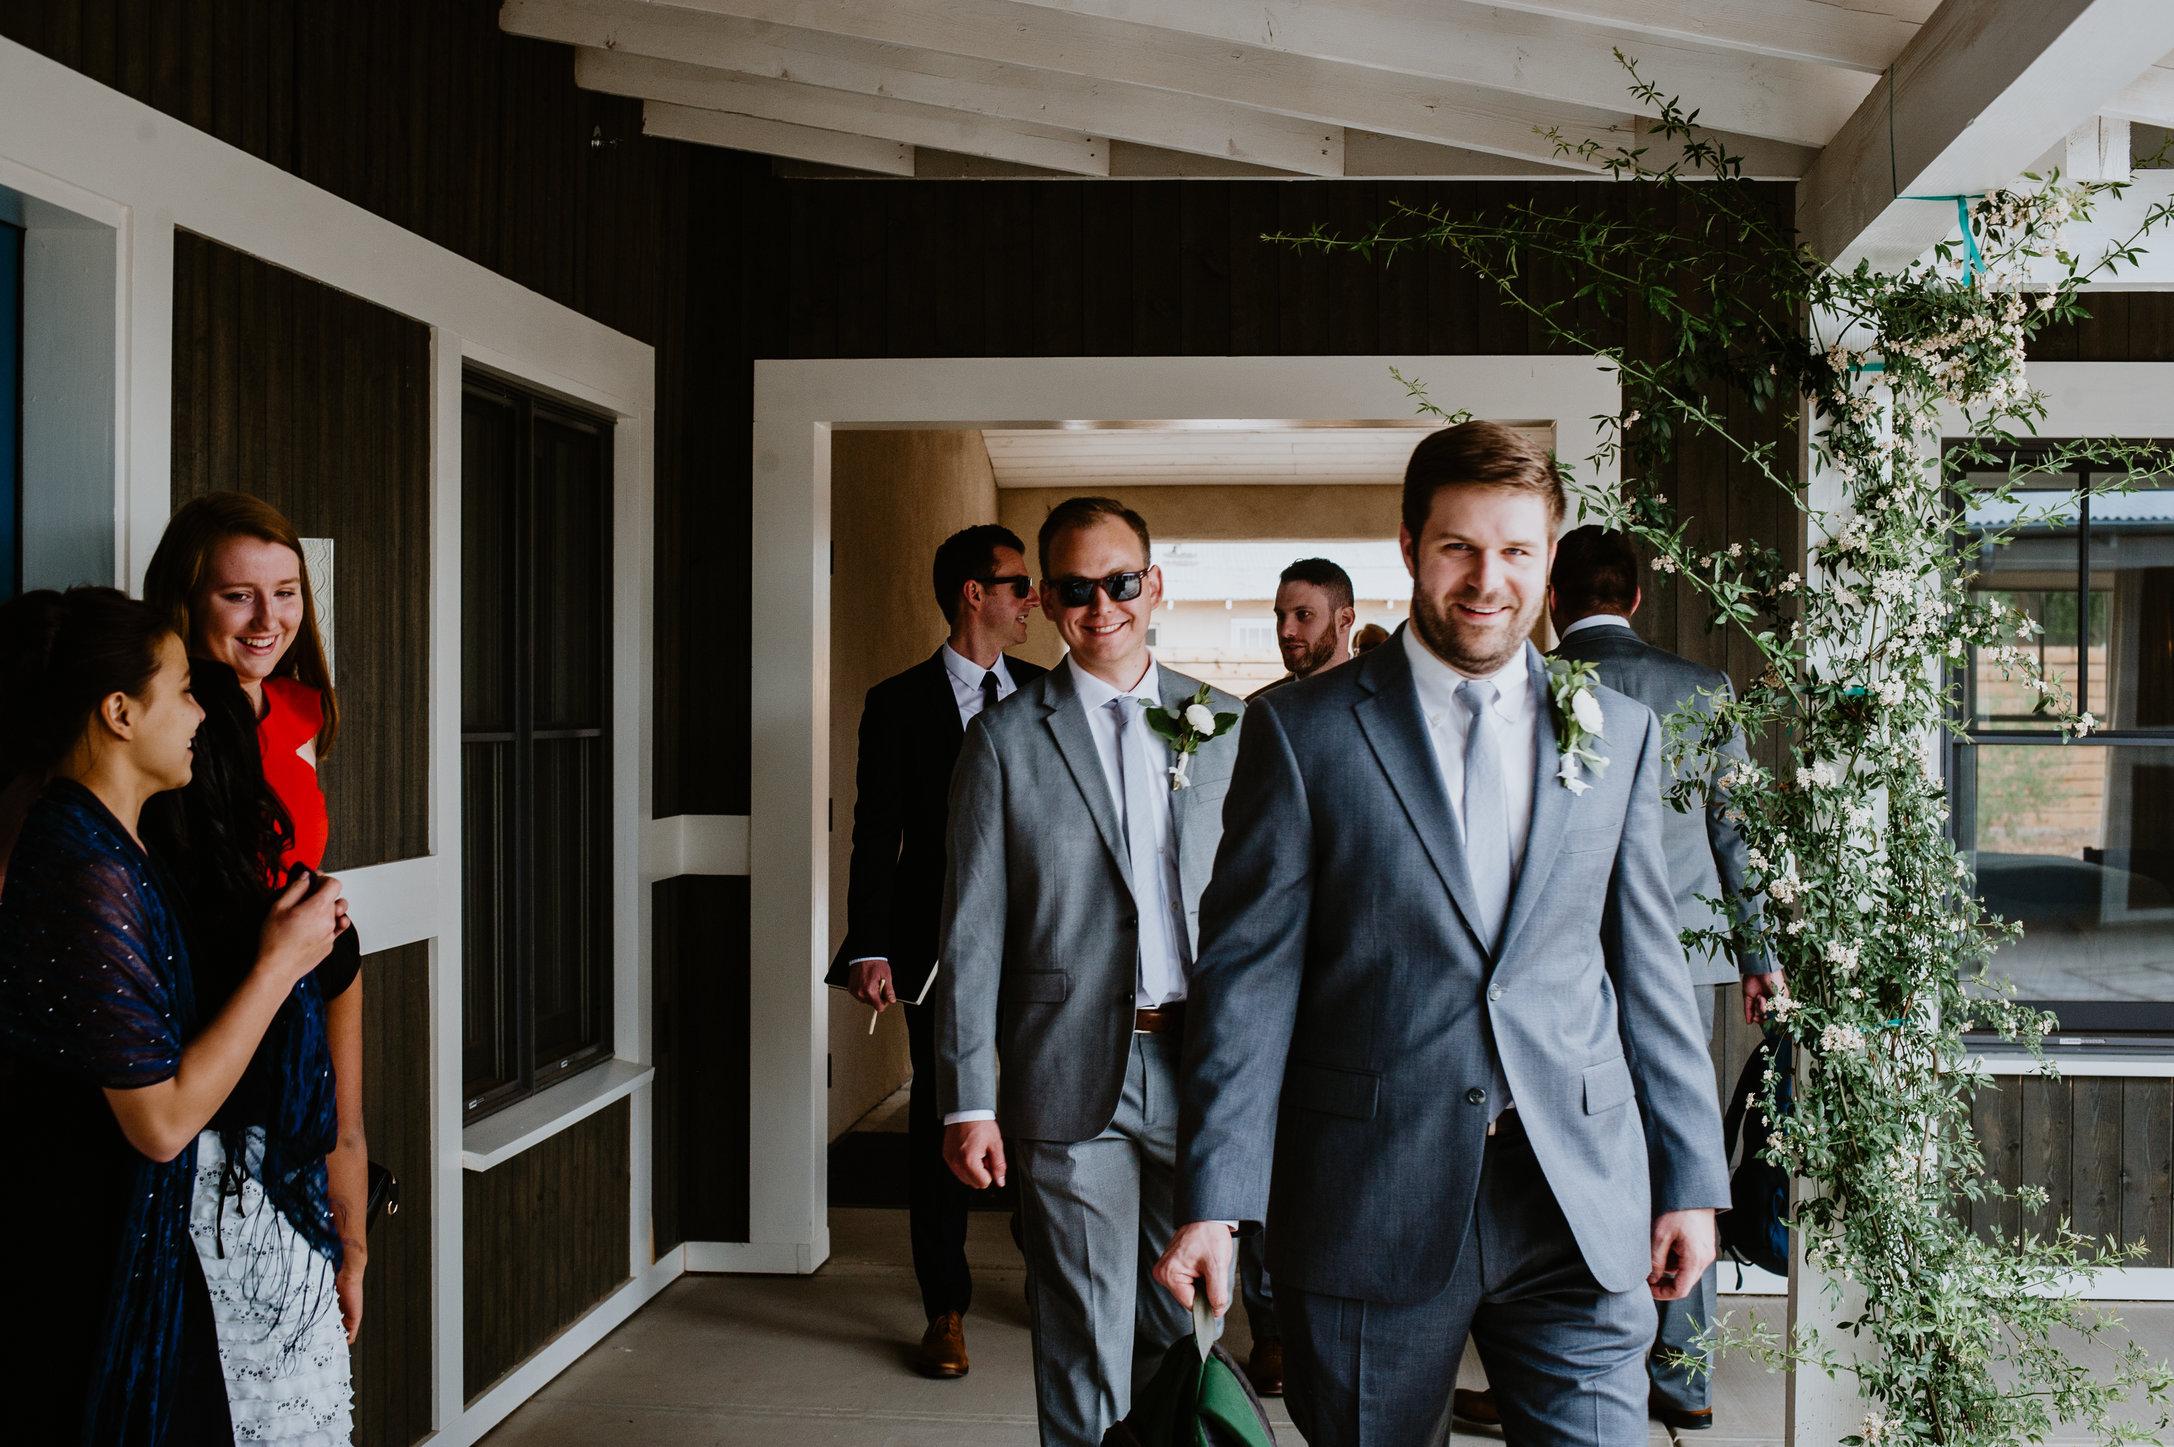 DandA-wedding-129.jpg